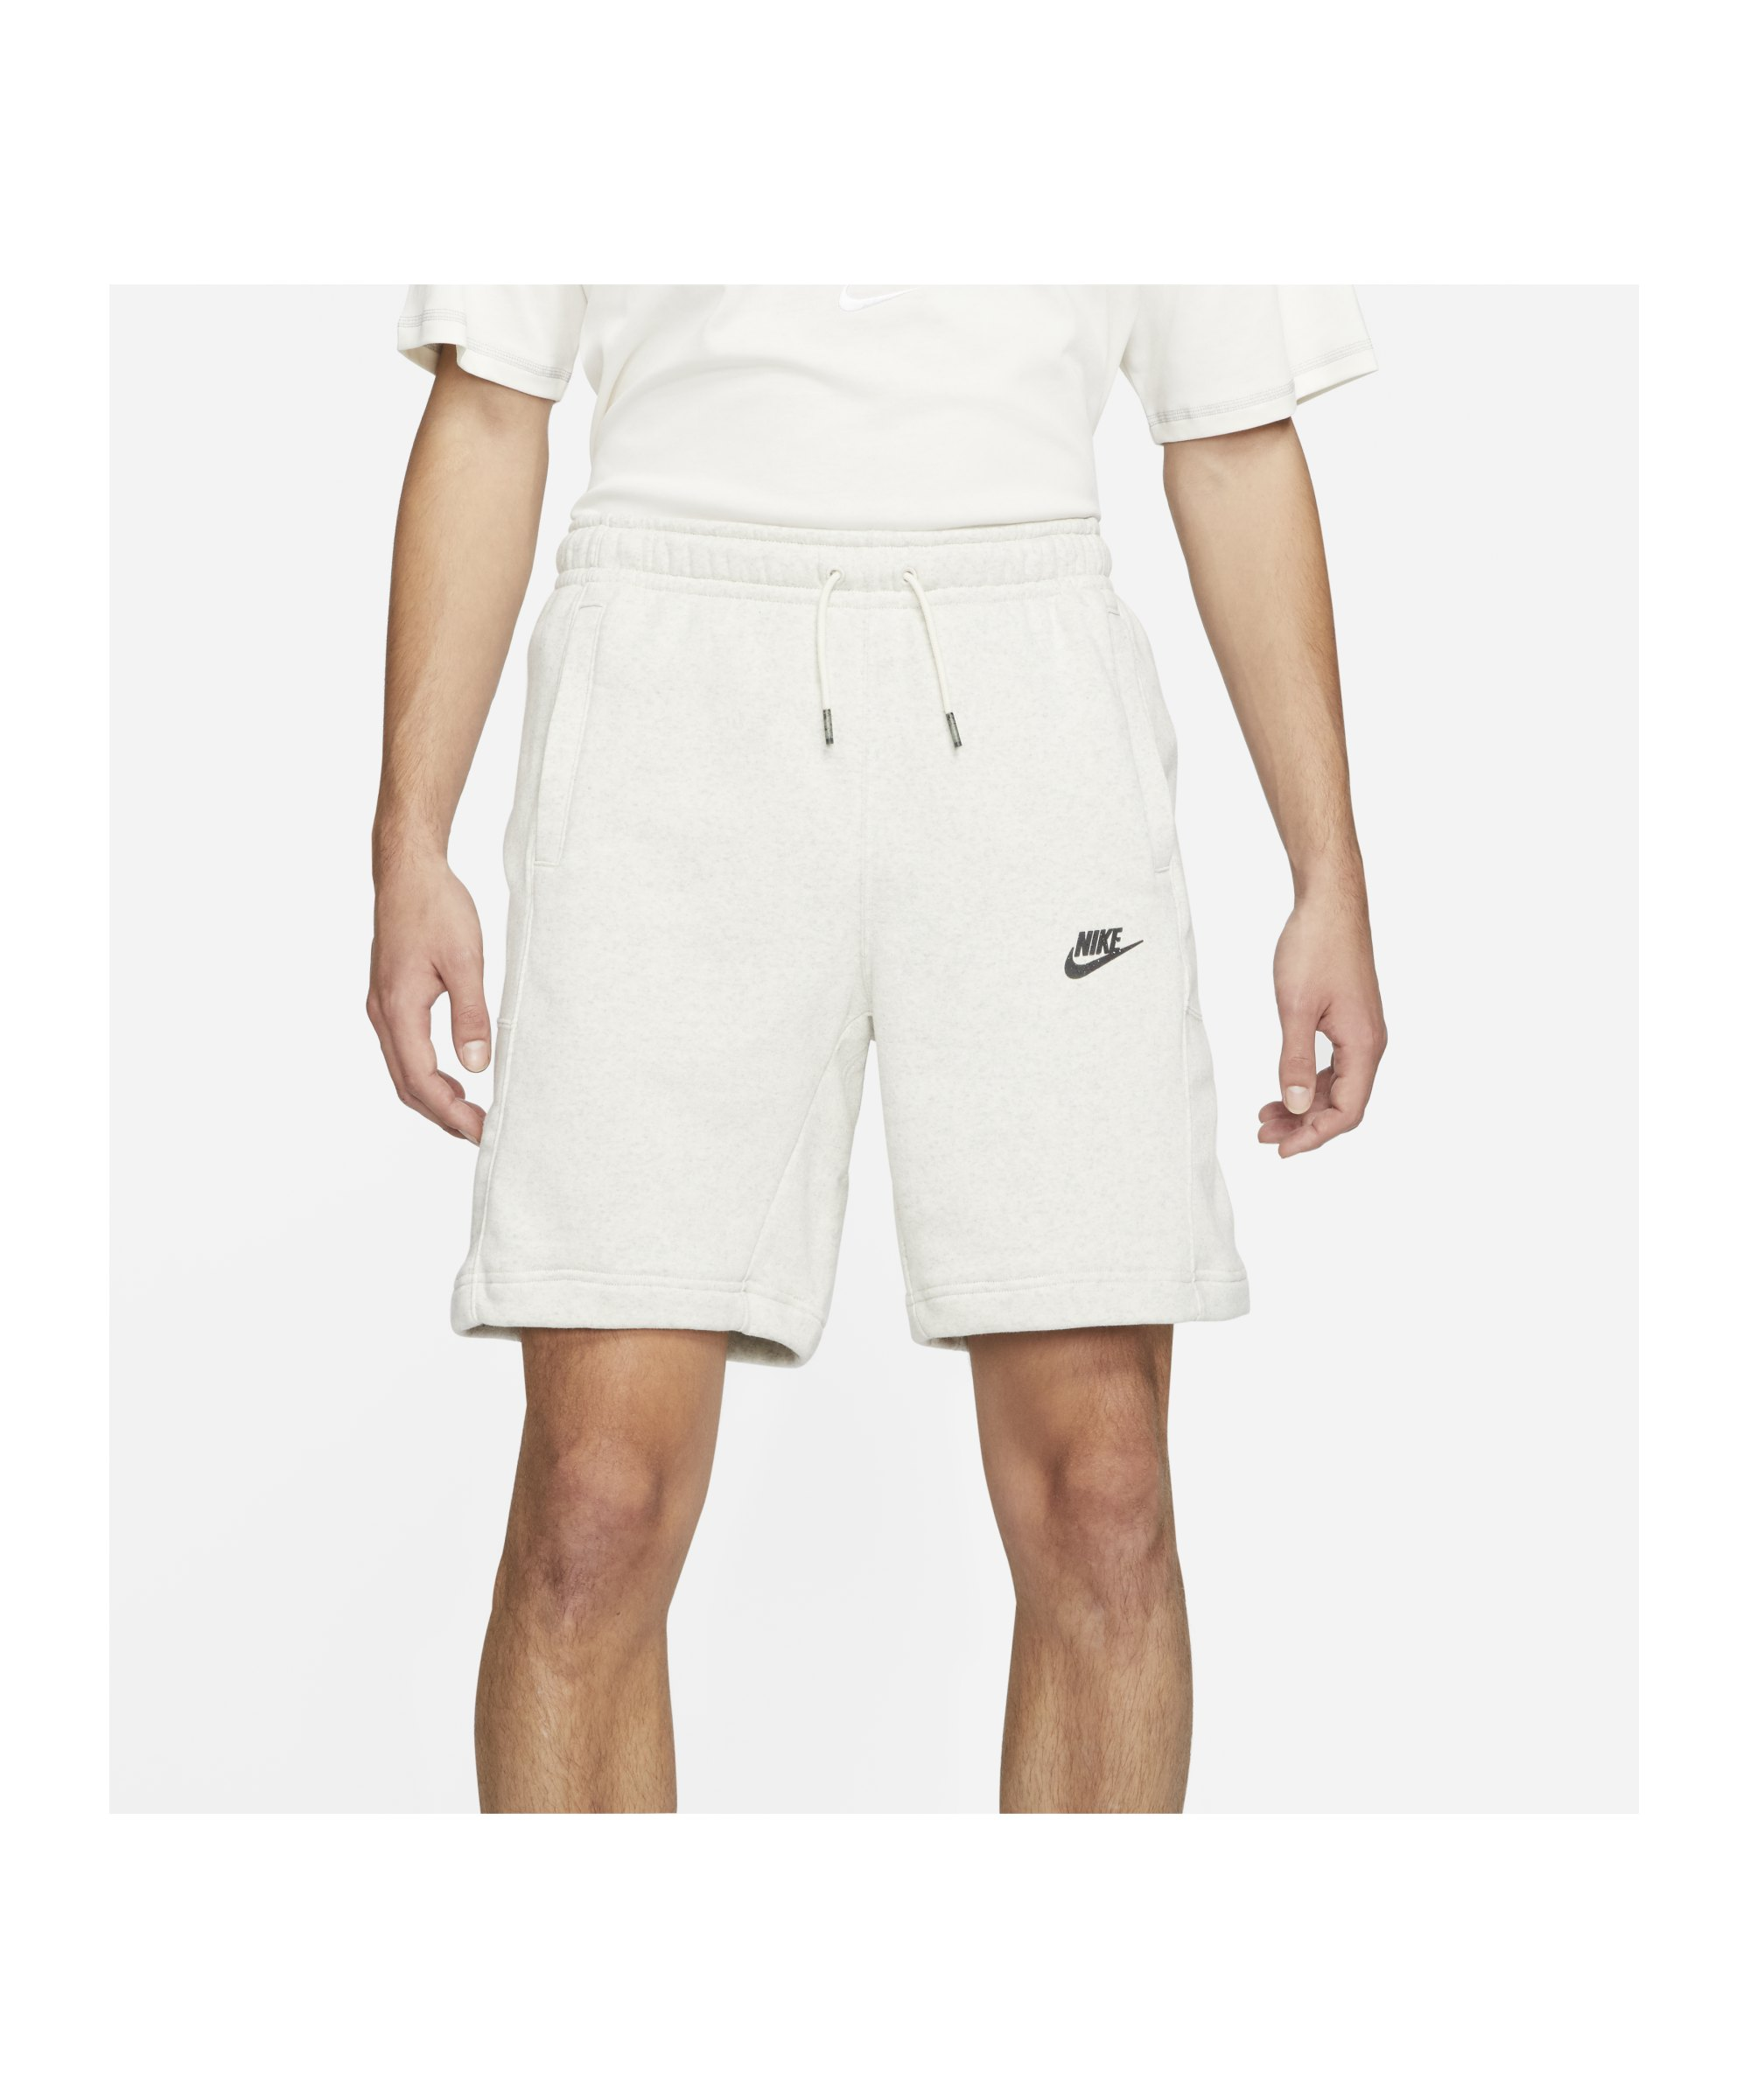 Nike Revival Short Weiss F101 - weiss